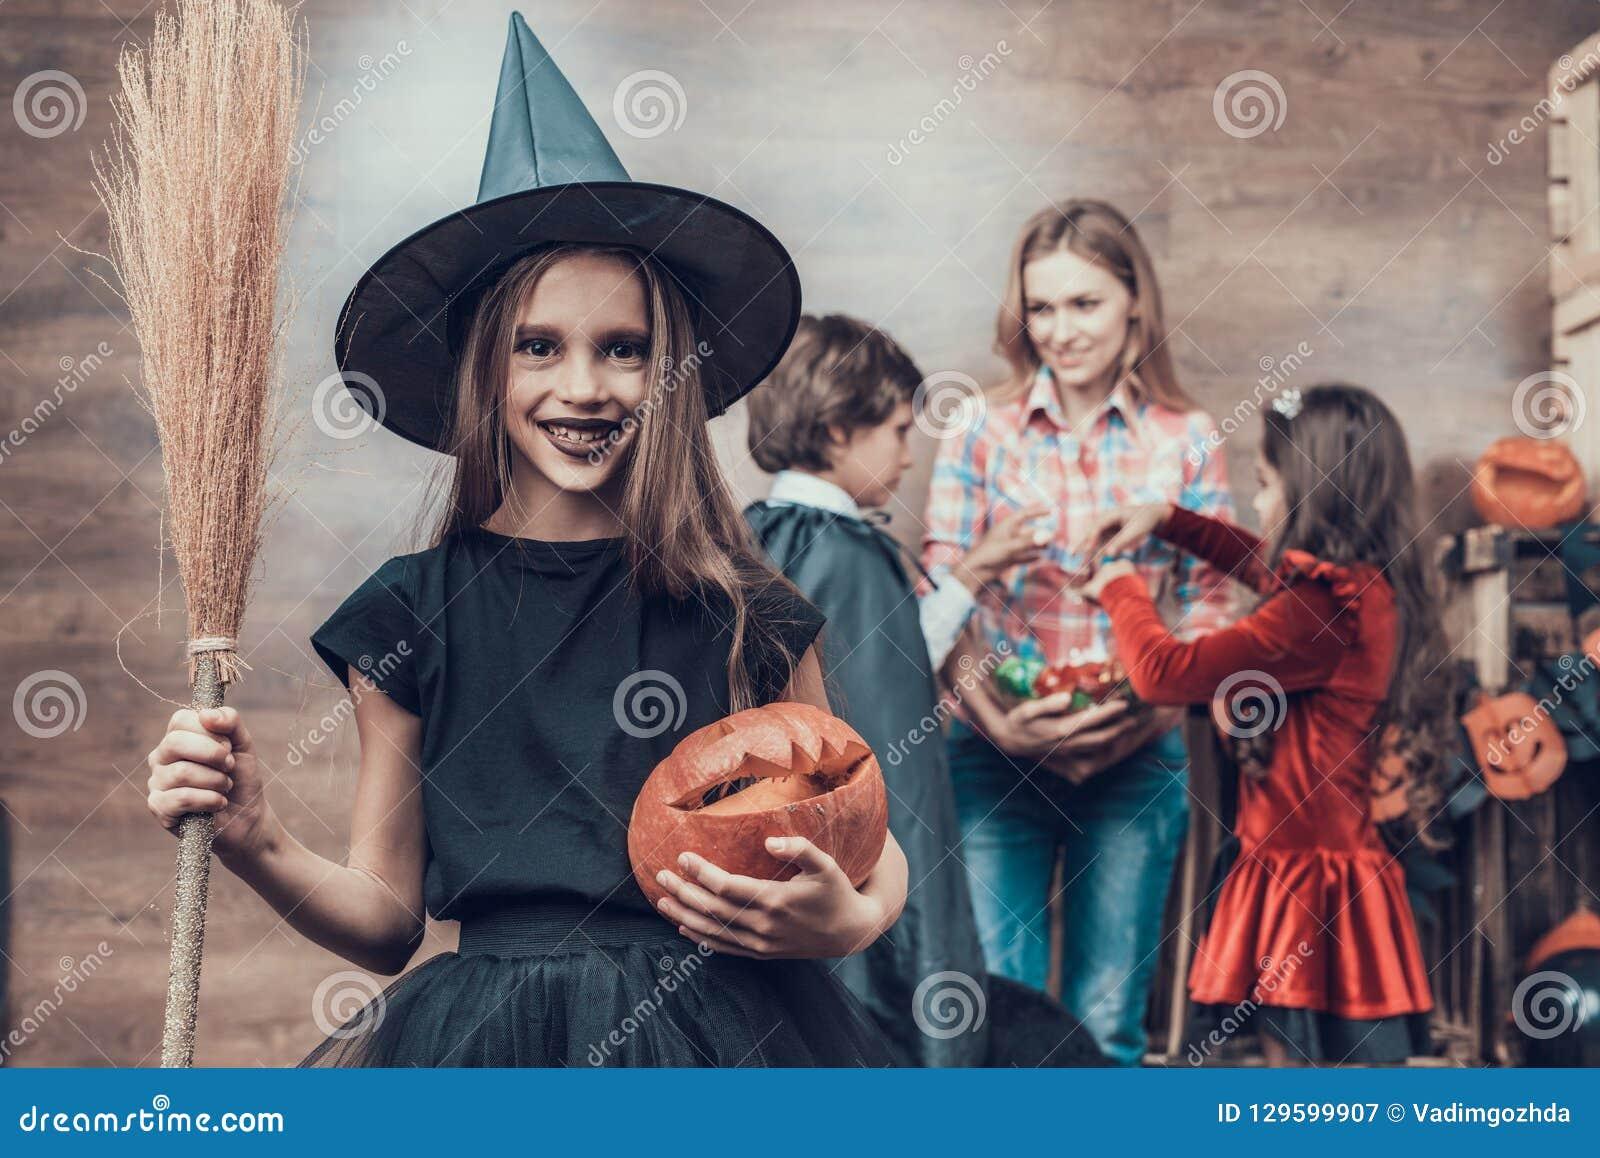 Vassoura vestindo da terra arrendada do traje da bruxa da moça